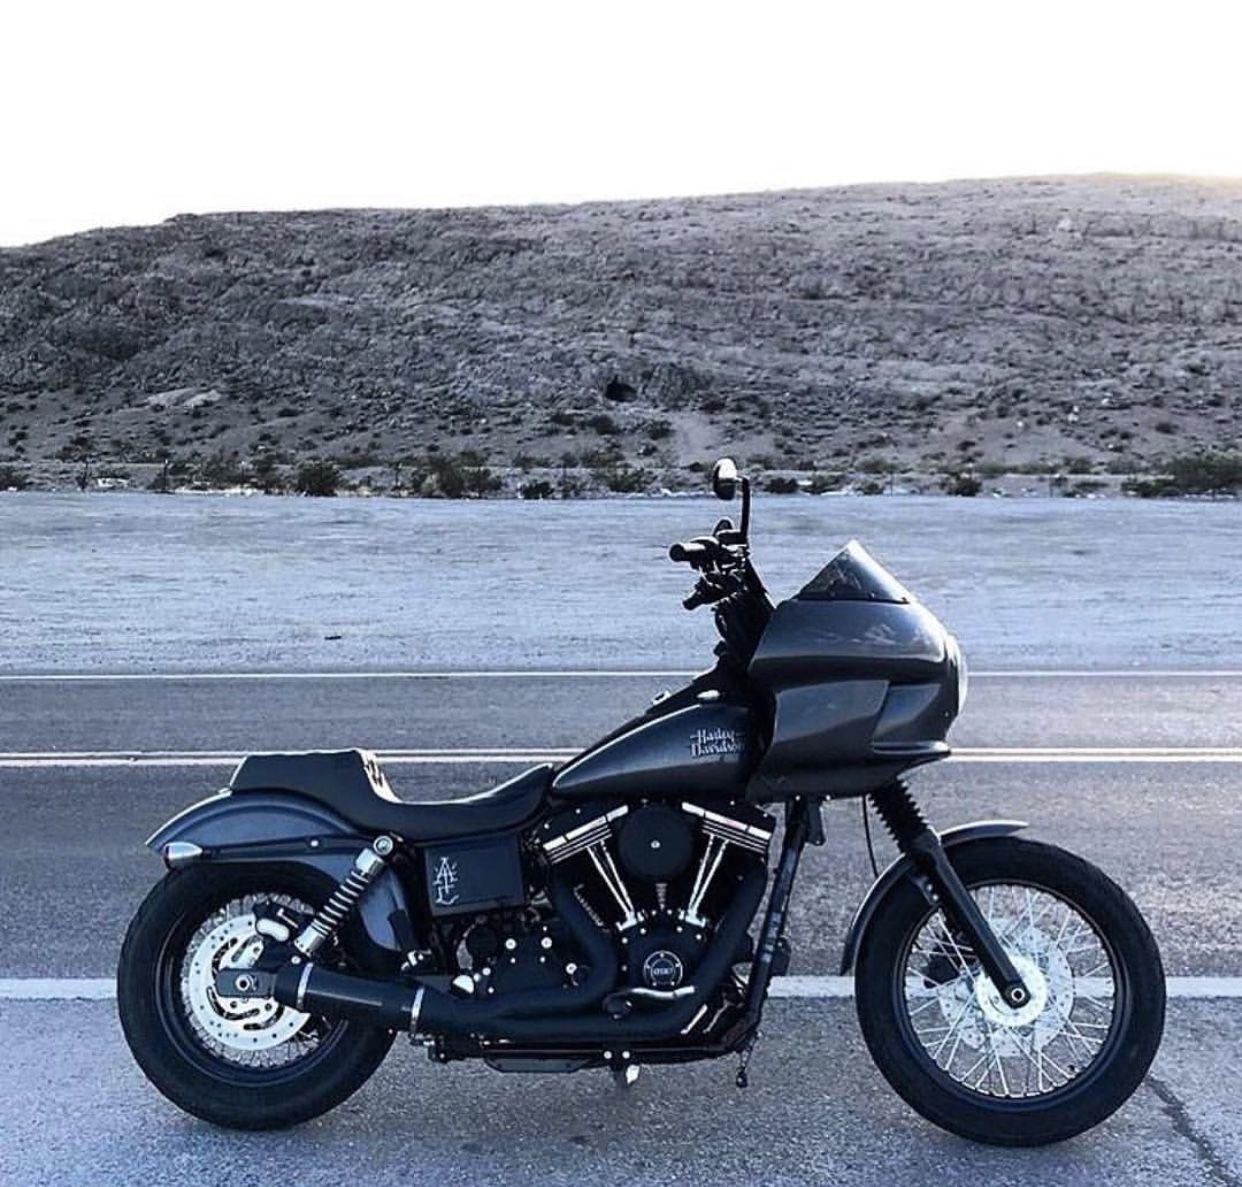 Pin by John Jacobucci on Motorcycles Harley davidson